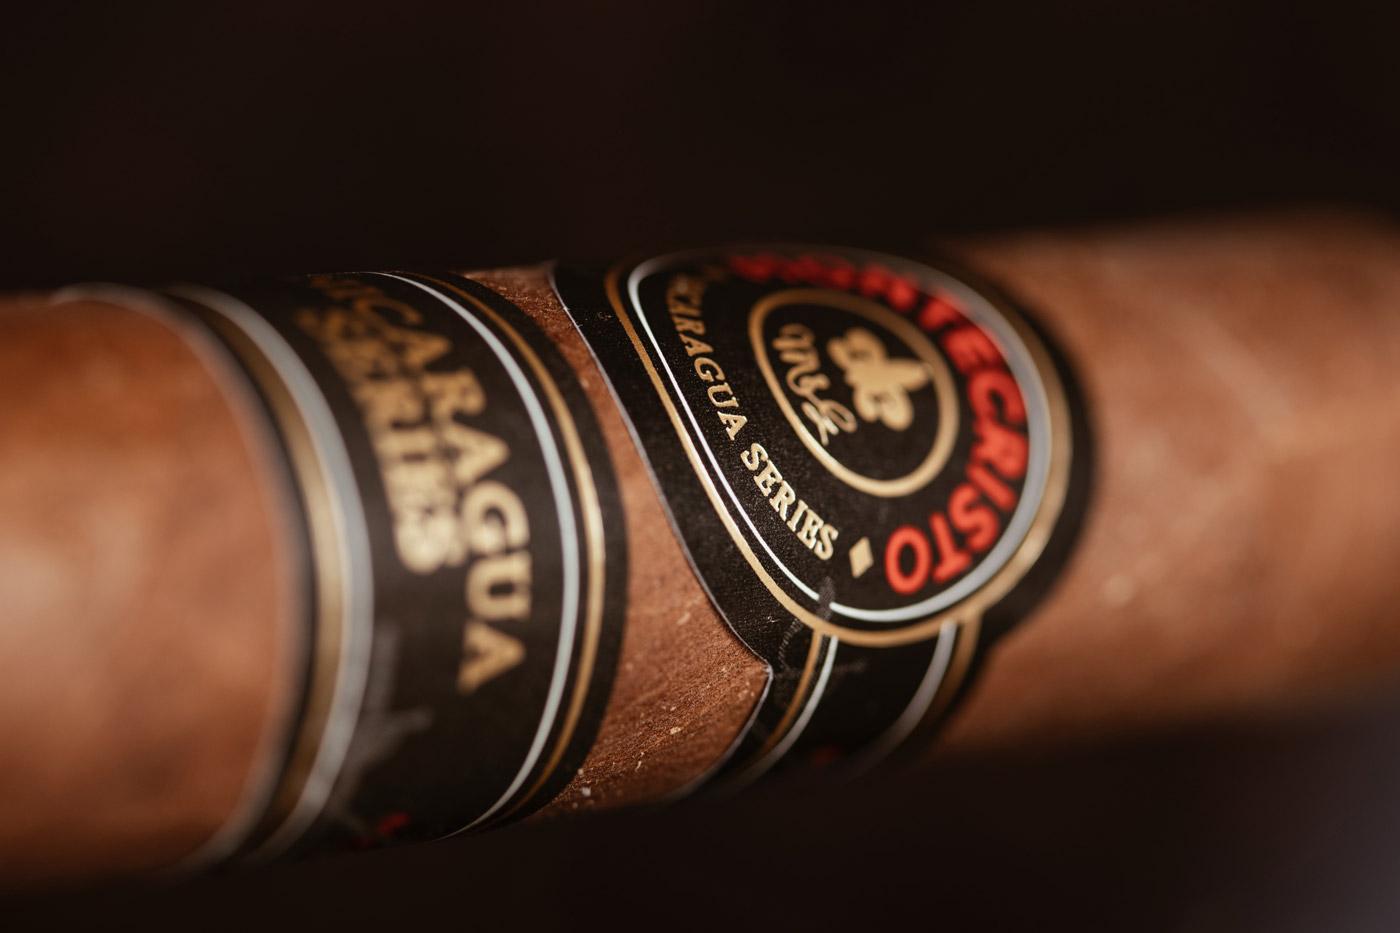 Montecristo Nicaragua Series Toro cigar review